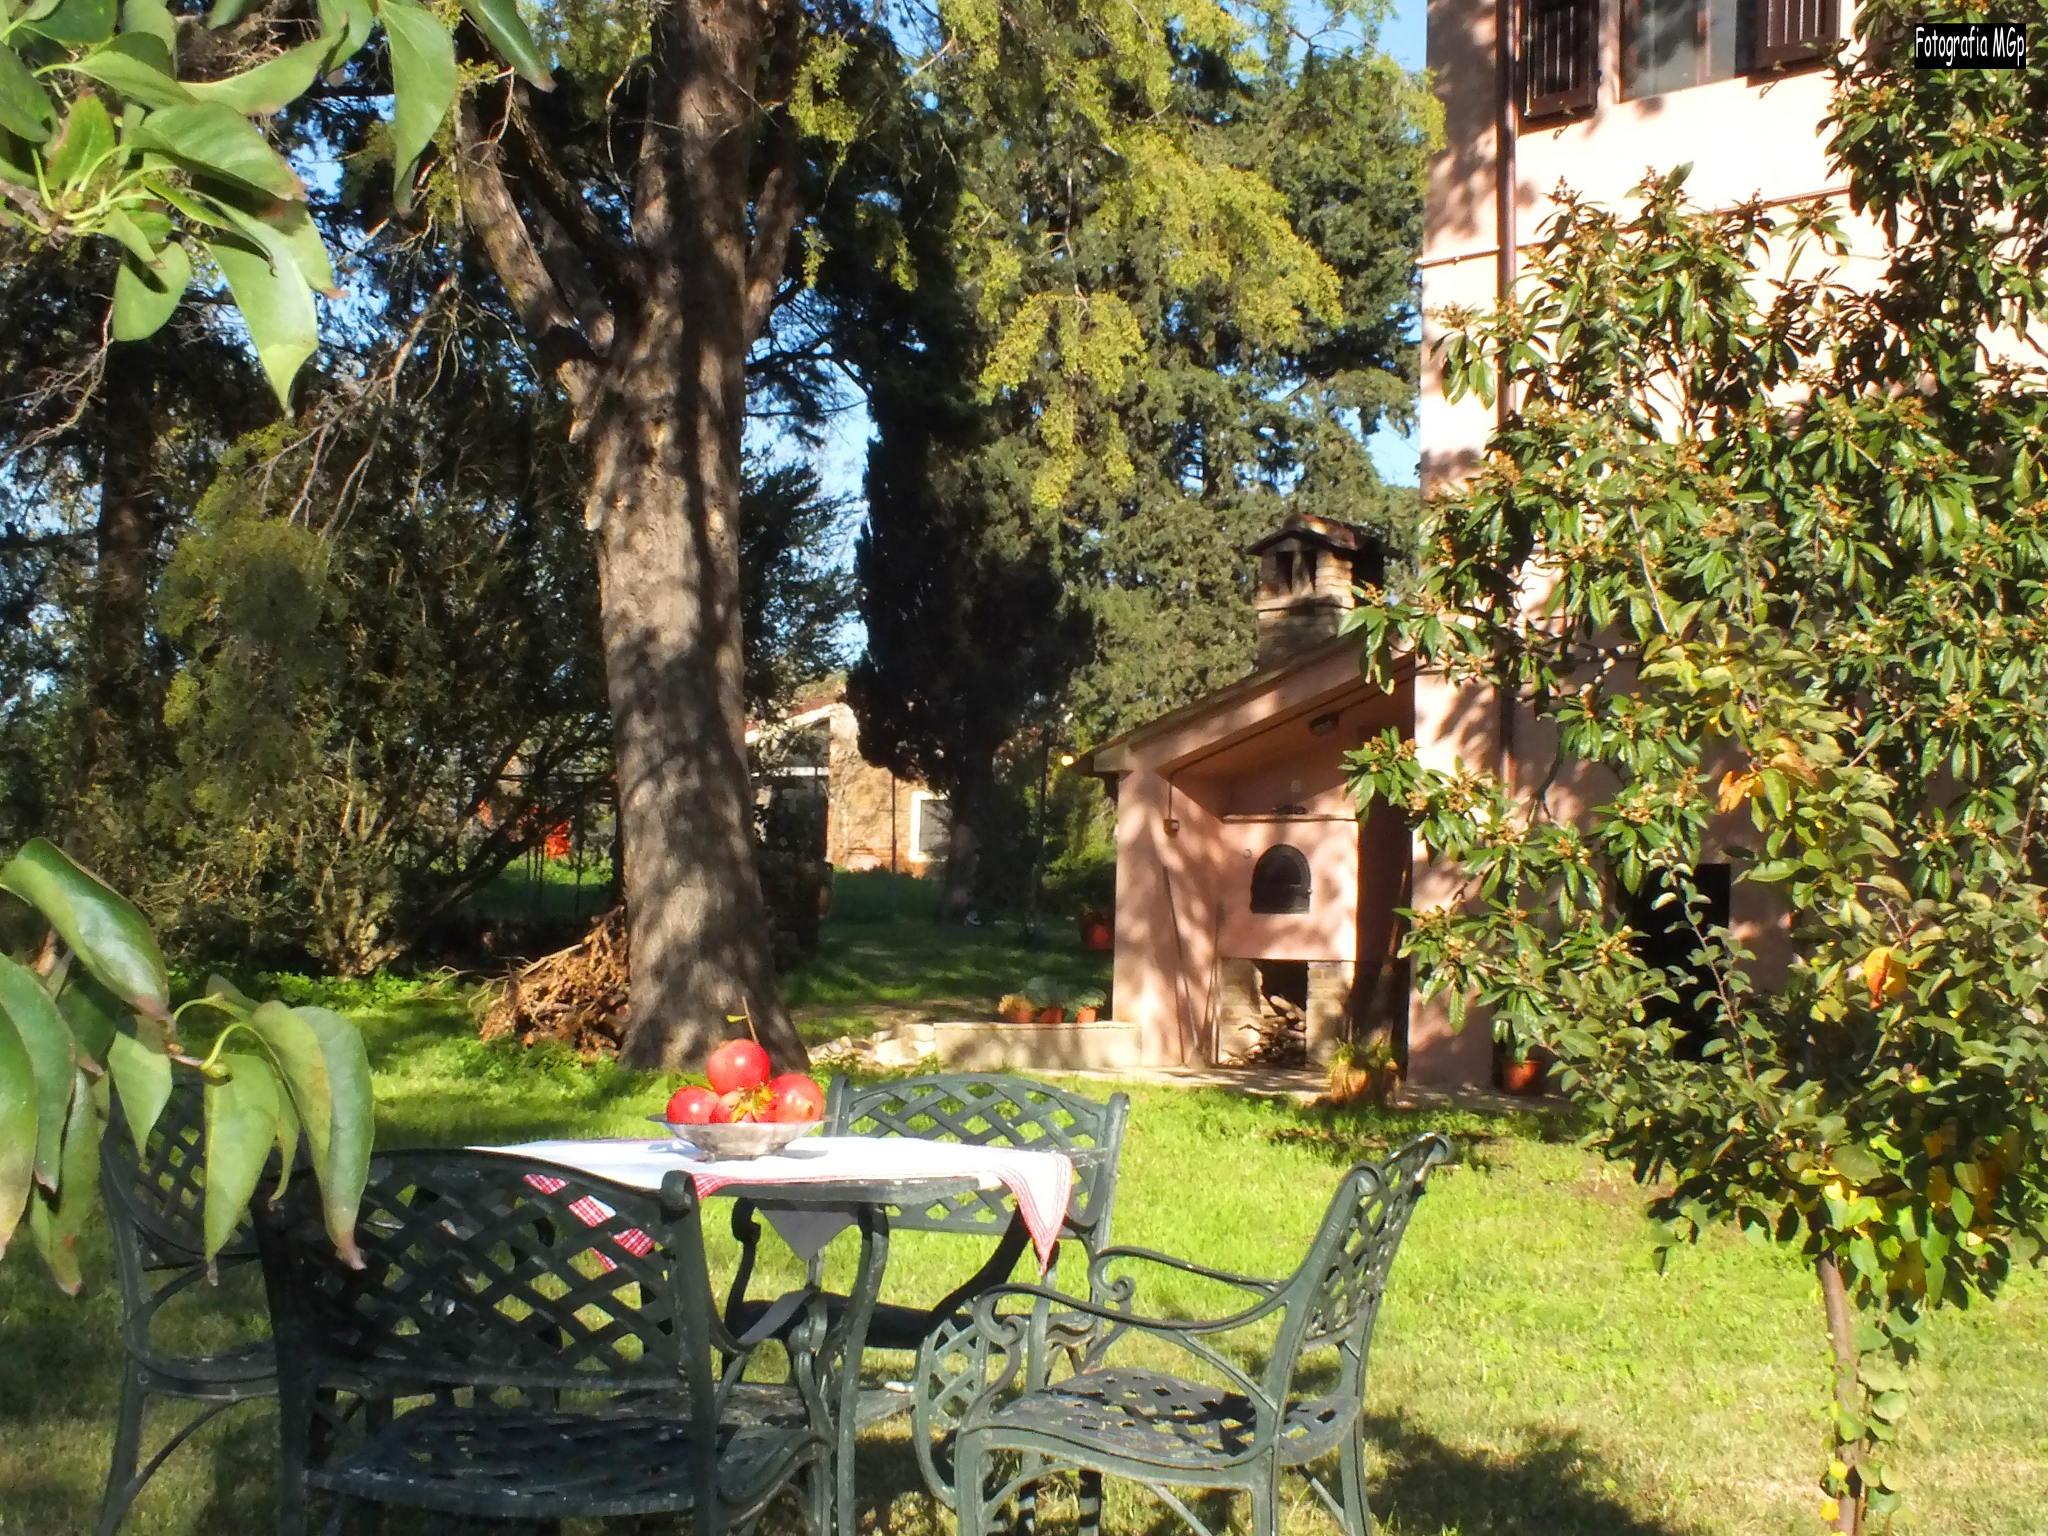 Gavorrano Italy  City new picture : Agriturismo La Concia Italy/Tuscany Gavorrano Farmhouse Reviews ...